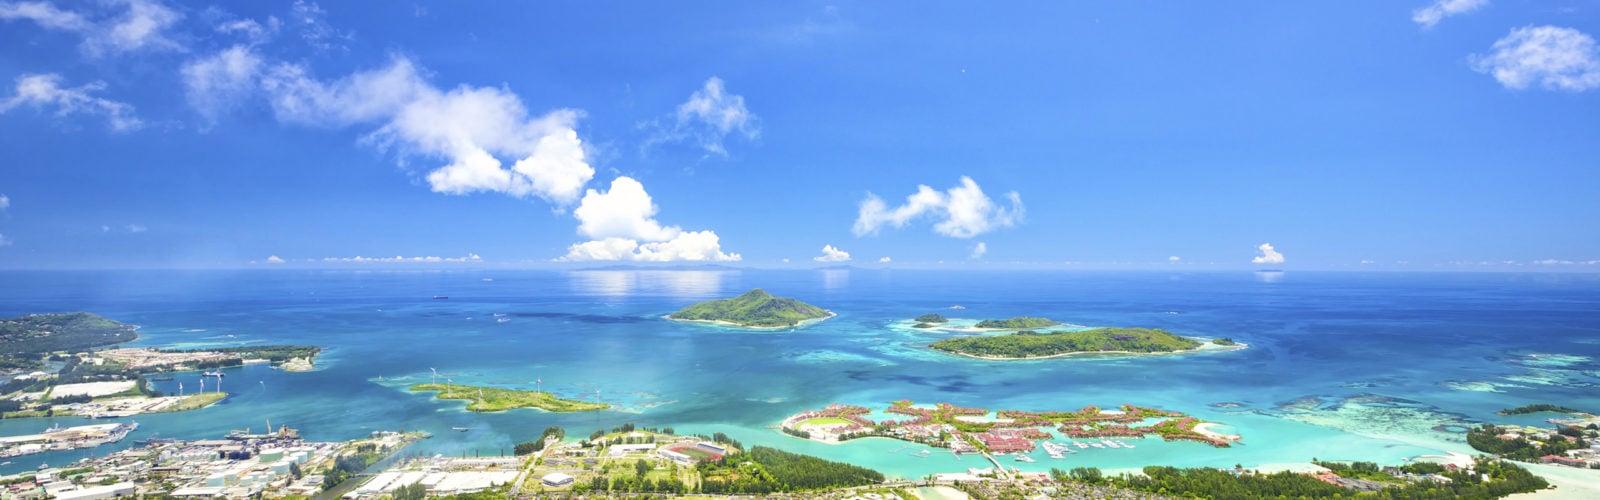 Aerial view of Mahe coastline, Seychelles